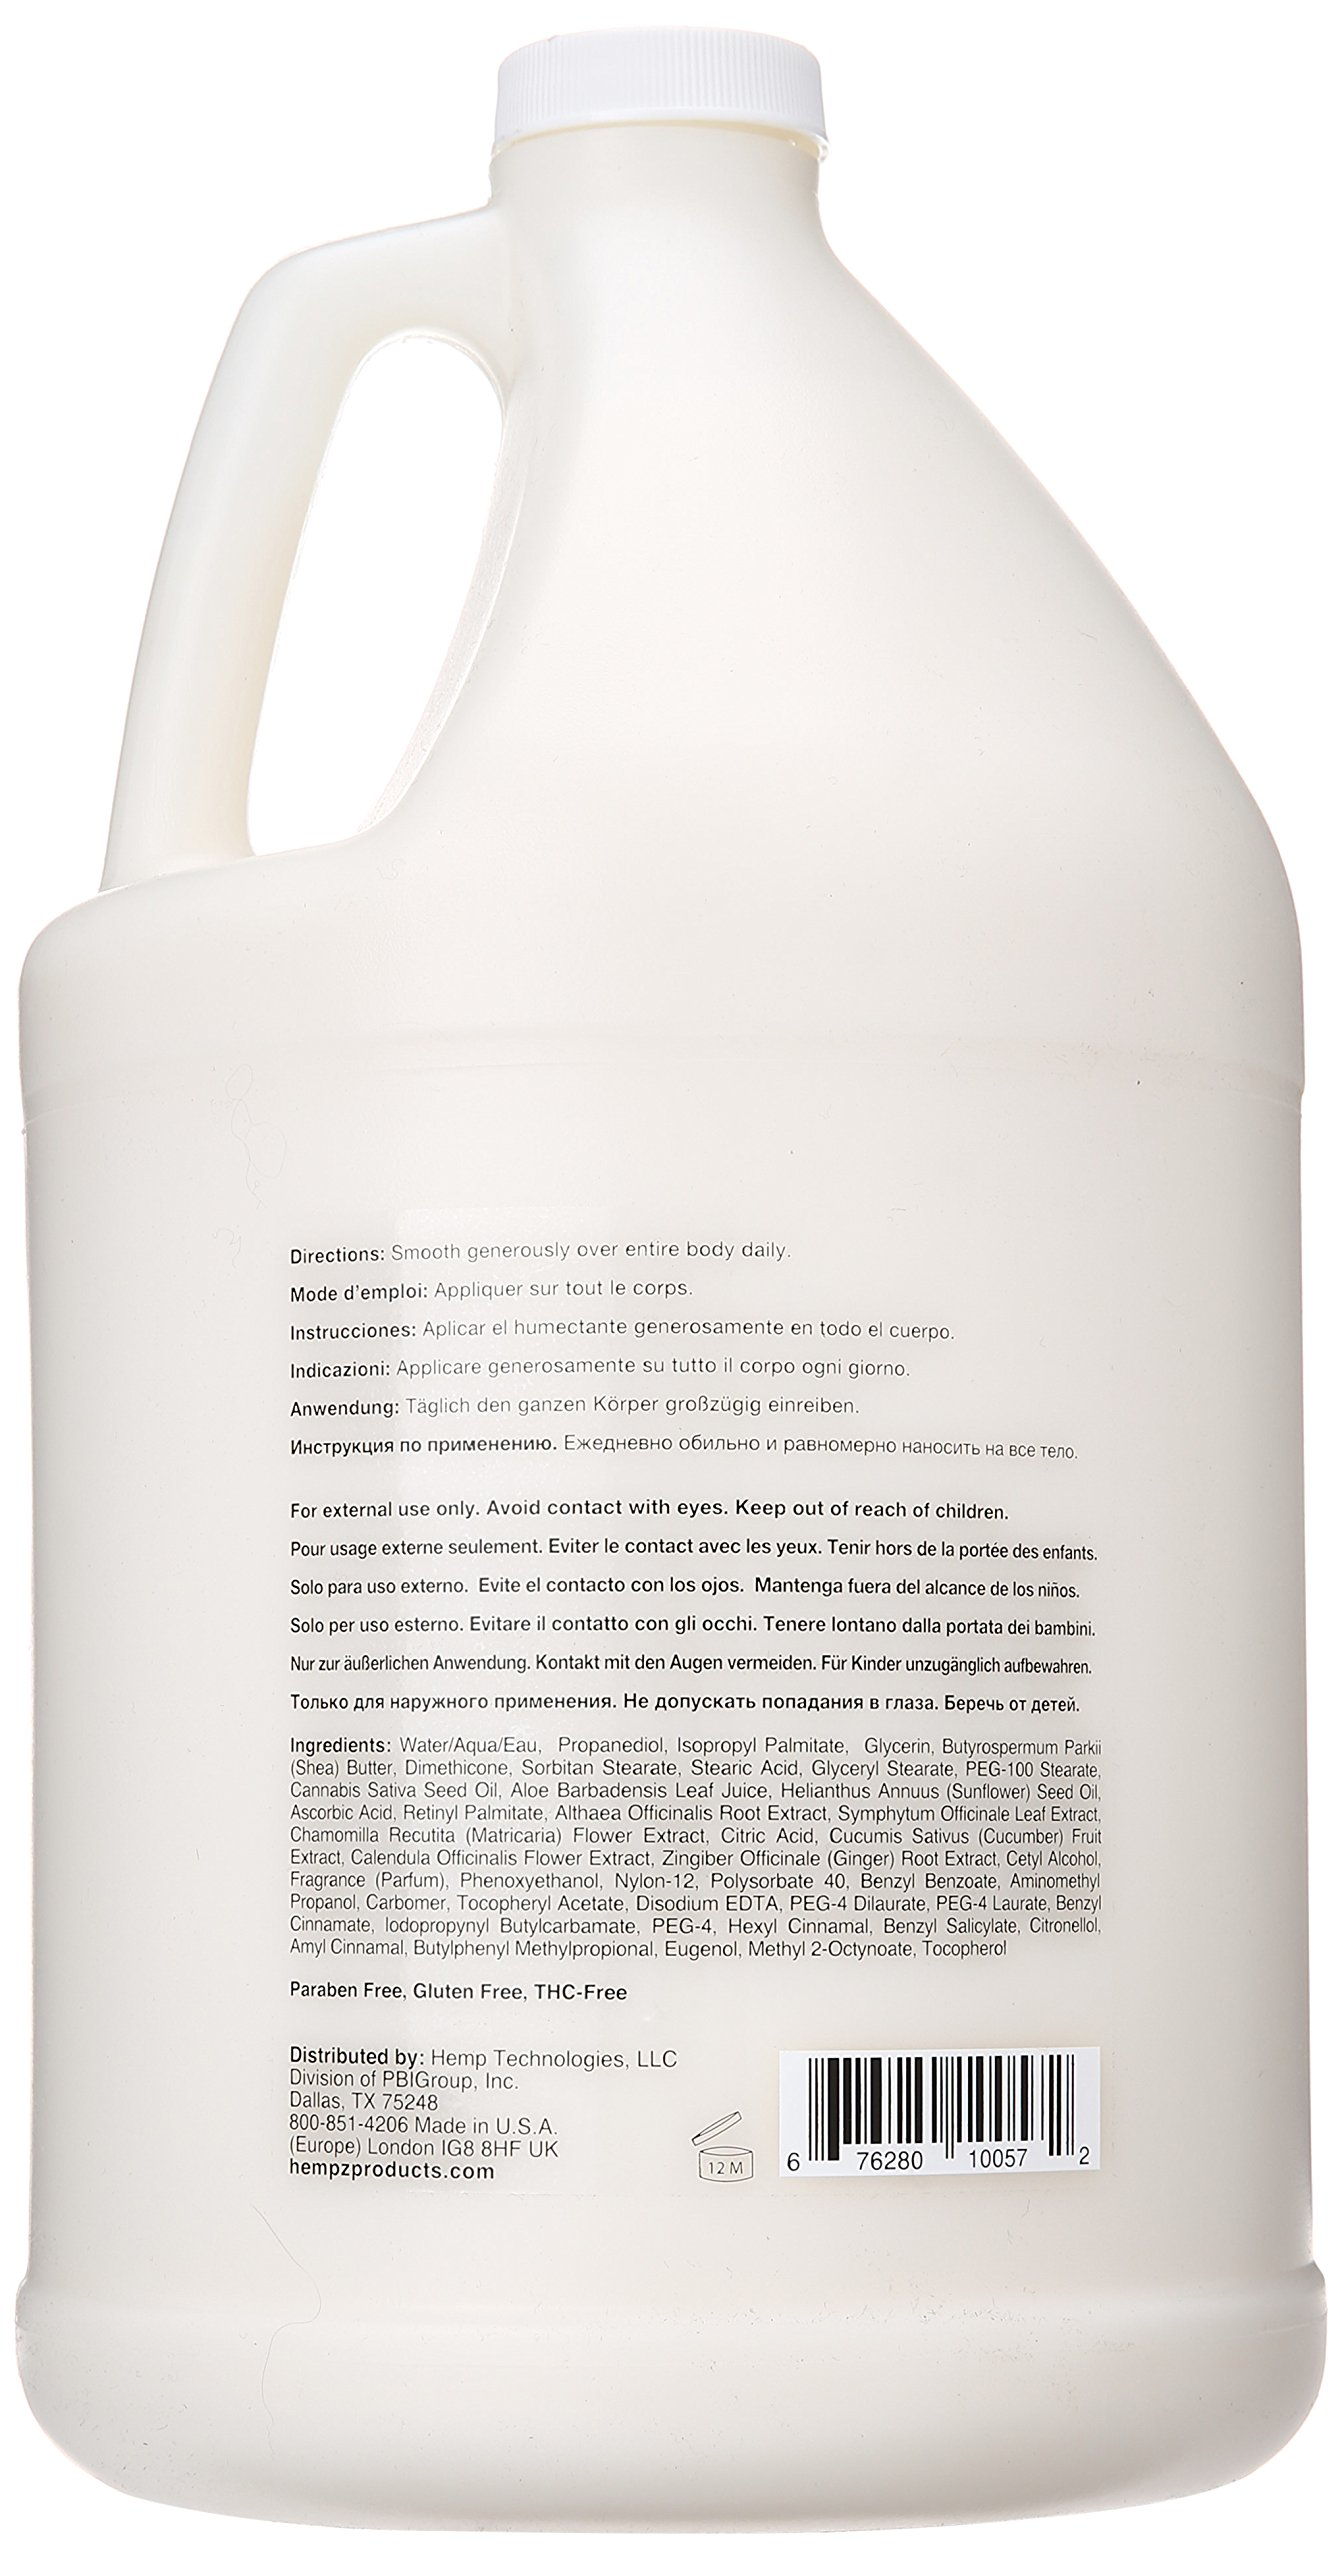 Hempz Moisturizer Lotion Gallon, 128 Ounce by Hempz (Image #2)